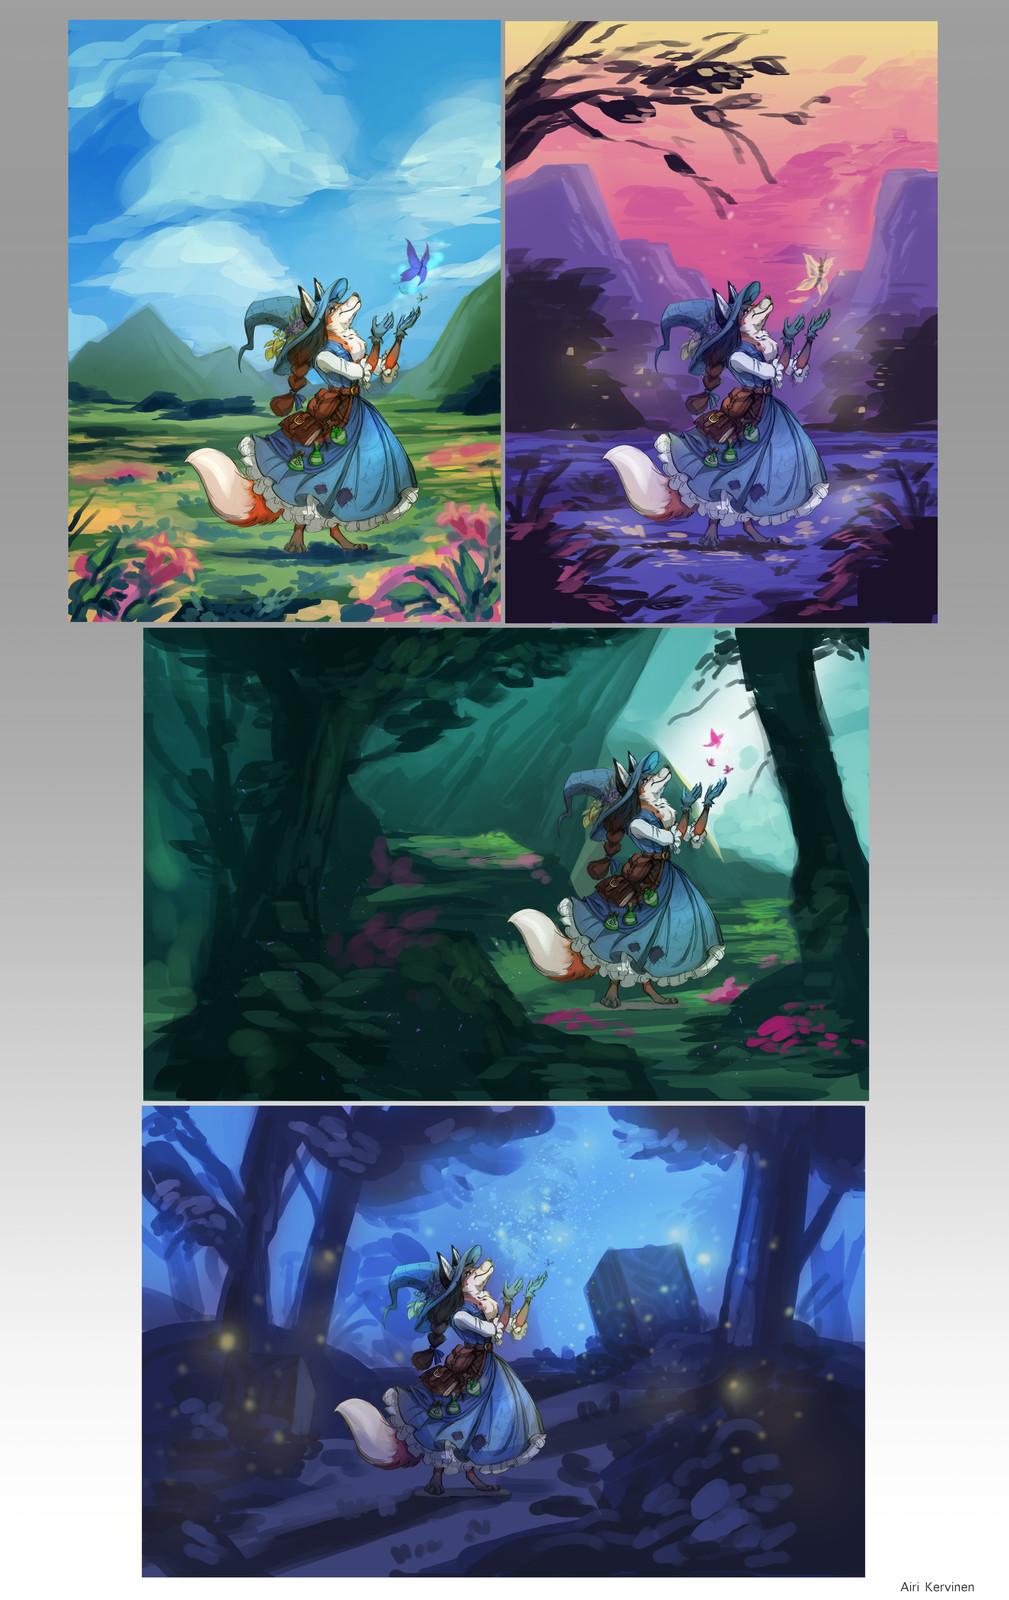 Thumbnails 1-4